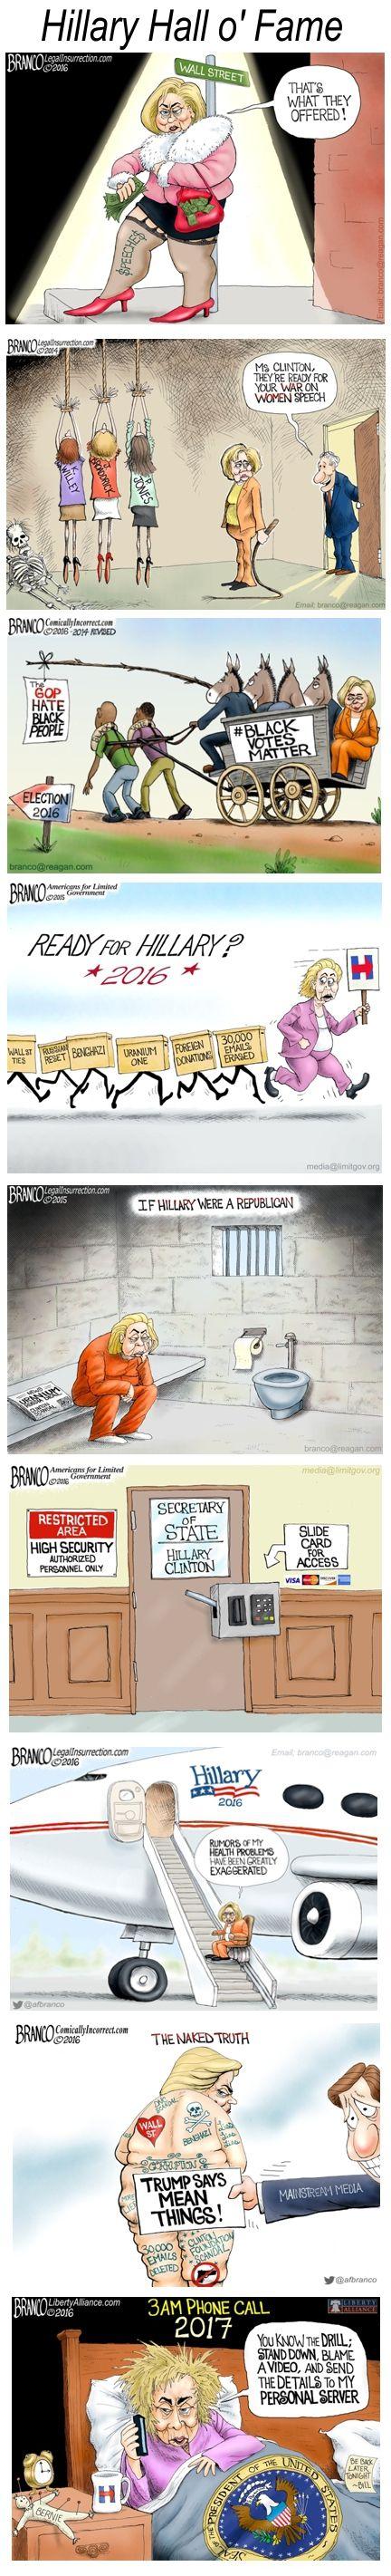 Cartoon: Hillary Clinton Hall O' Fame